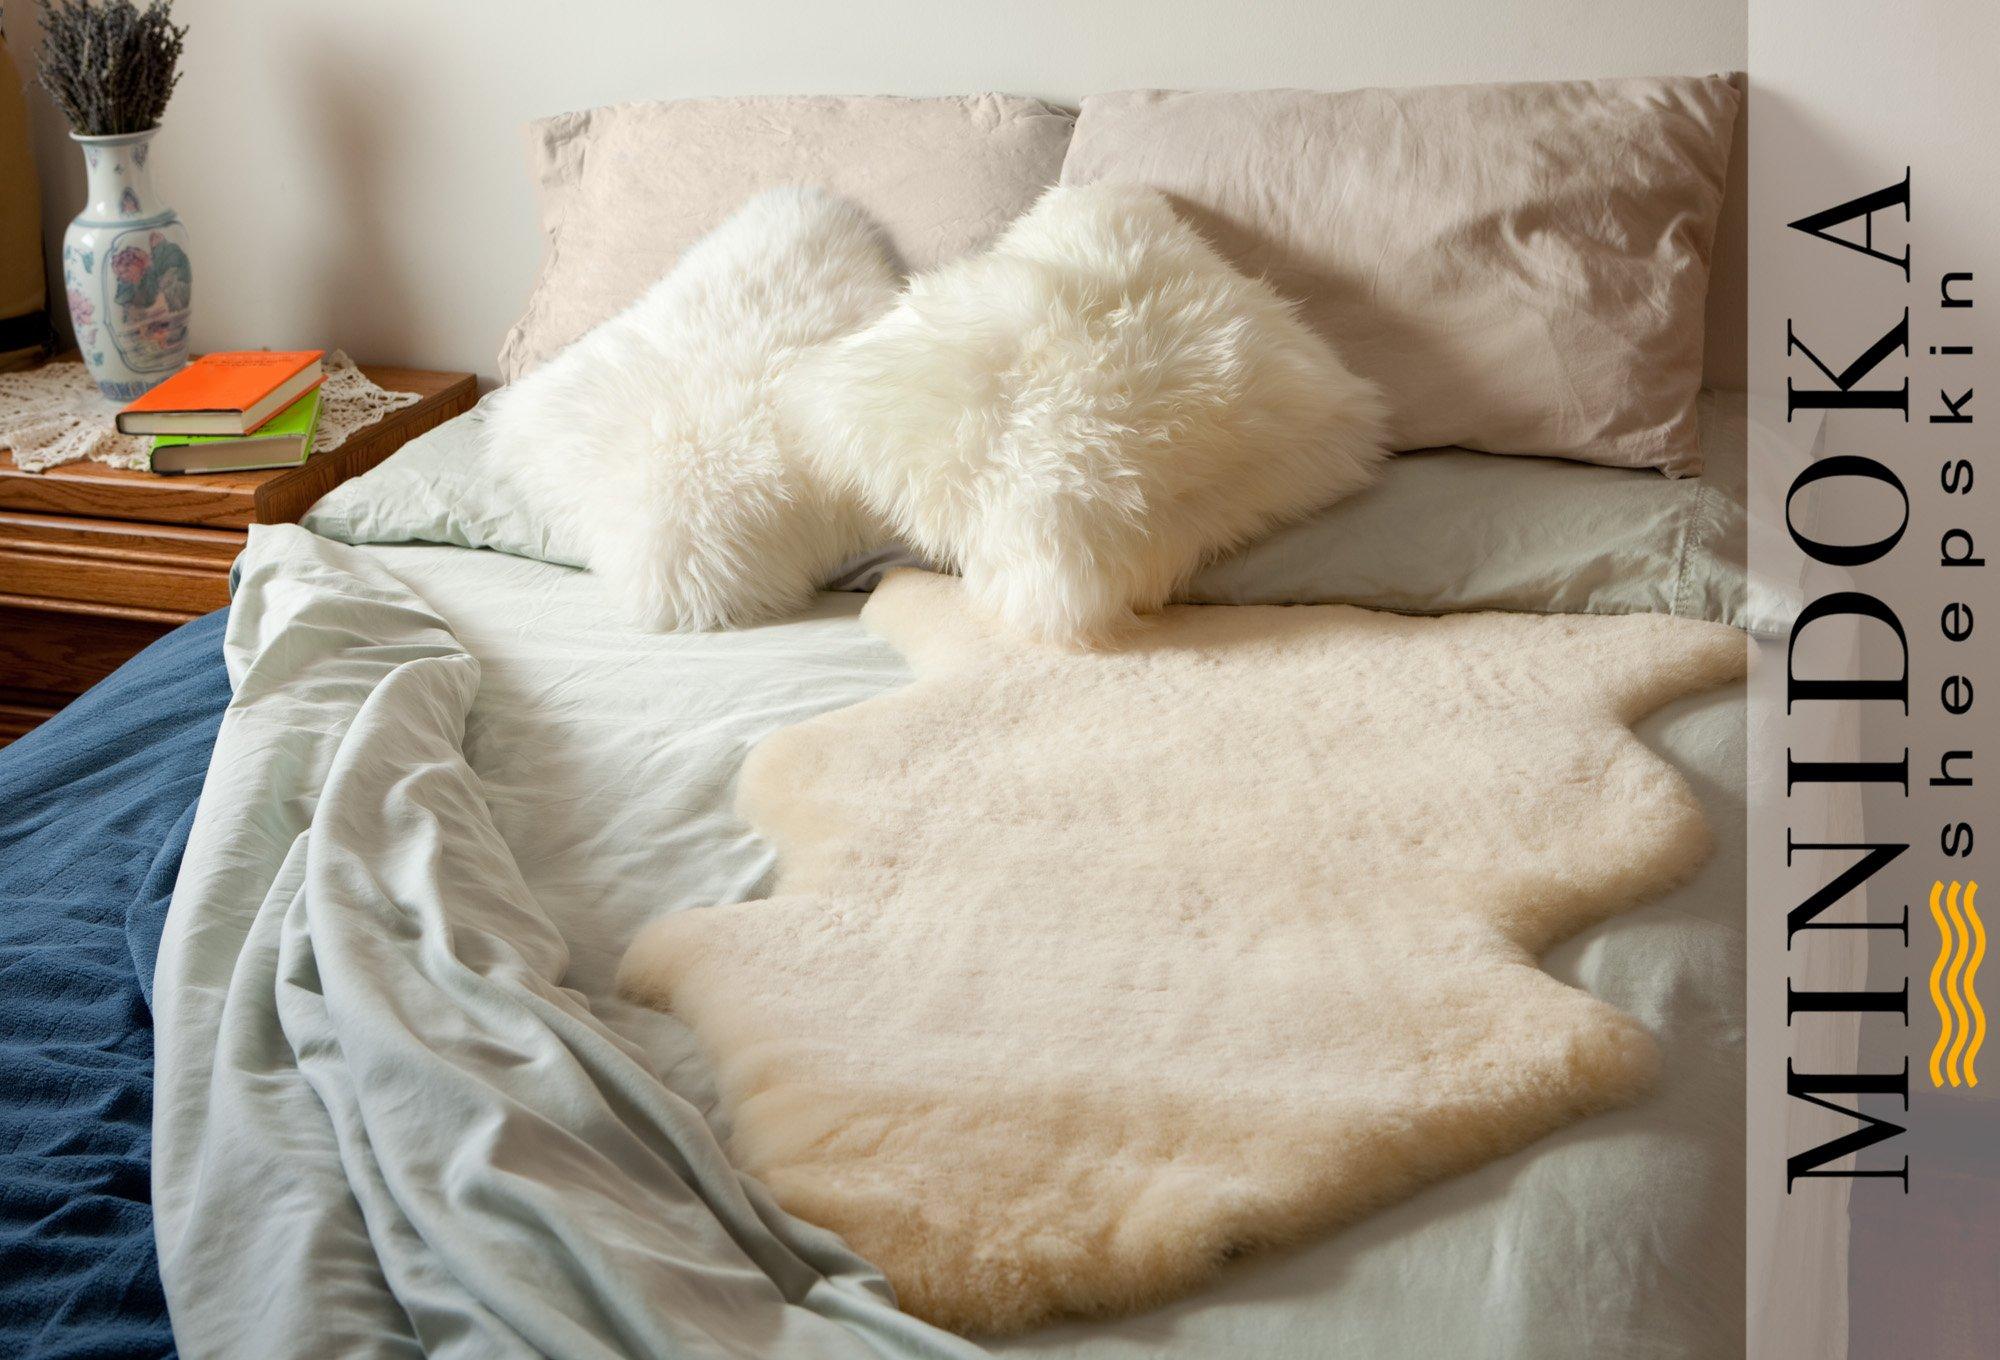 Minidoka Sheepskin Medical Underlay, XL 41 inches and up, Plush and Silky Soft Merino Lambskin, by Desert Breeze Distributing